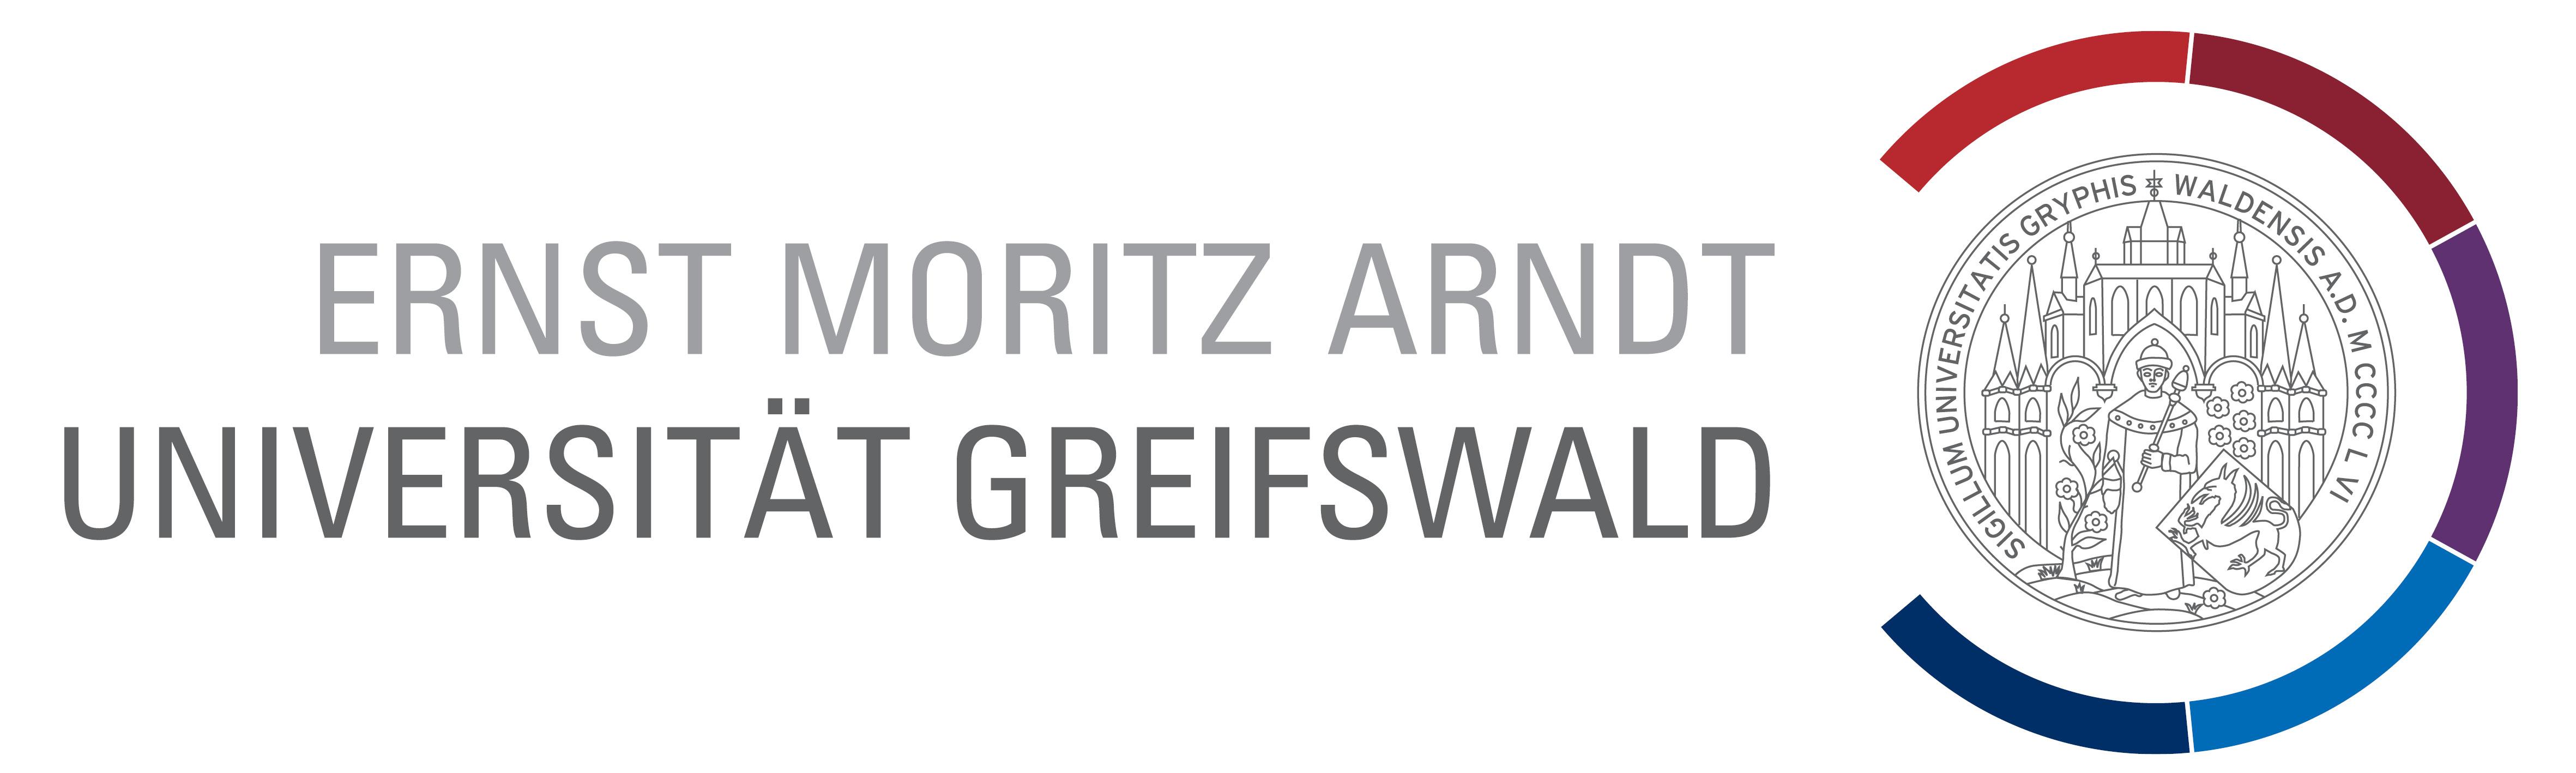 Uni_Greifswald.jpg